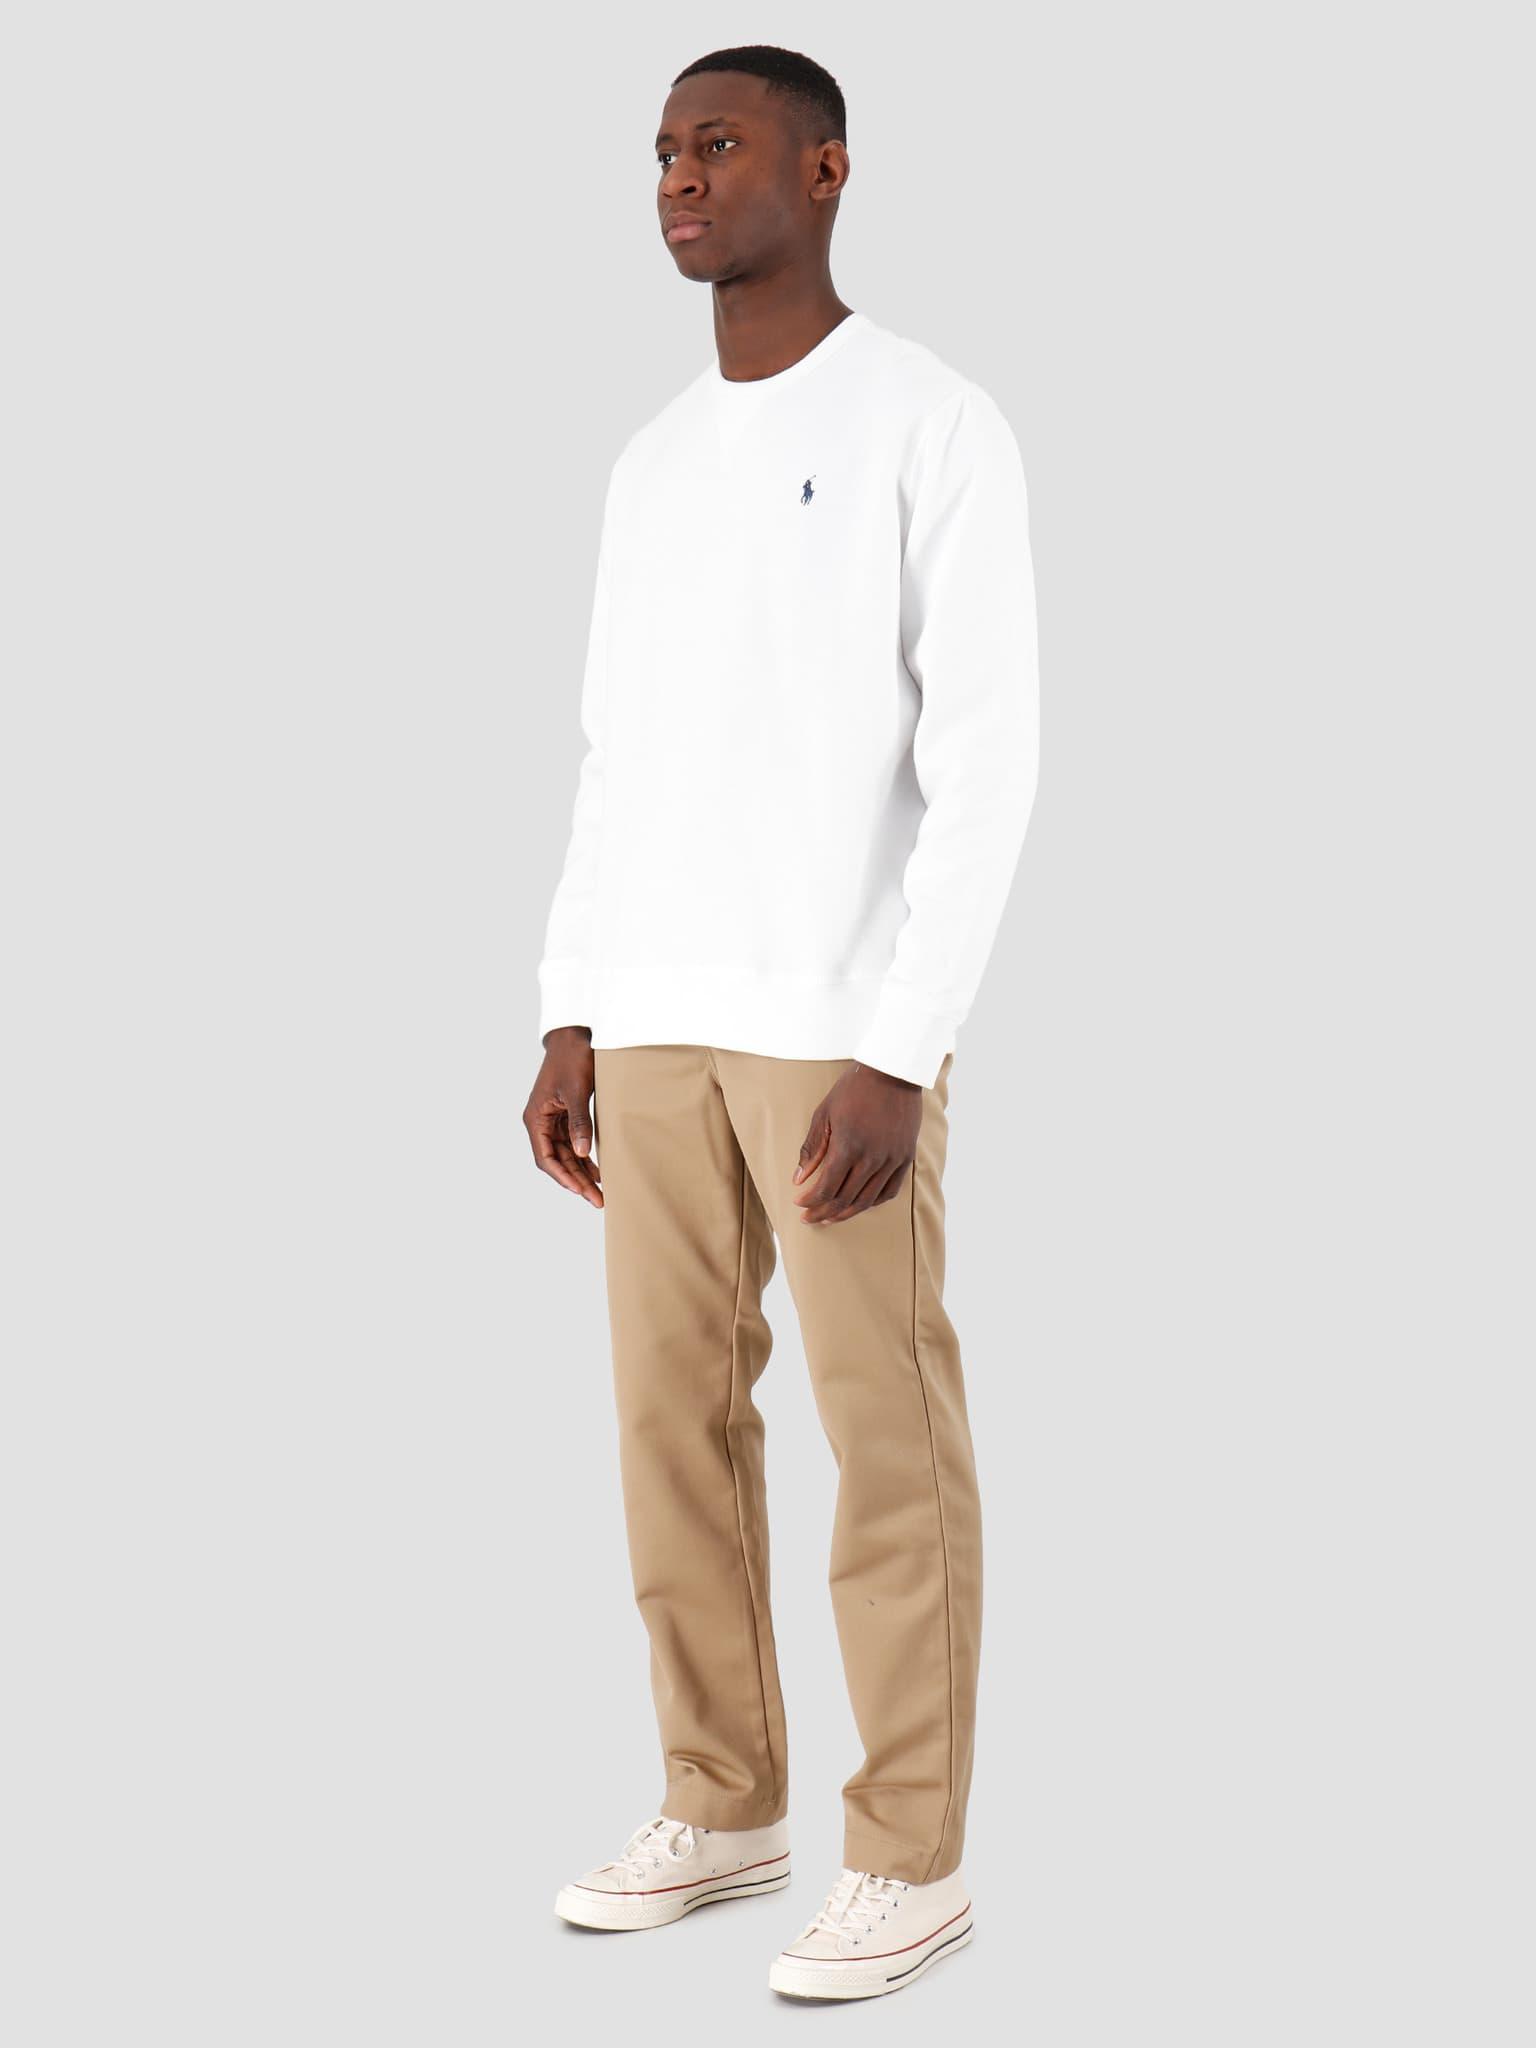 Lscnm1 Longsleeve Knit White 710766772009